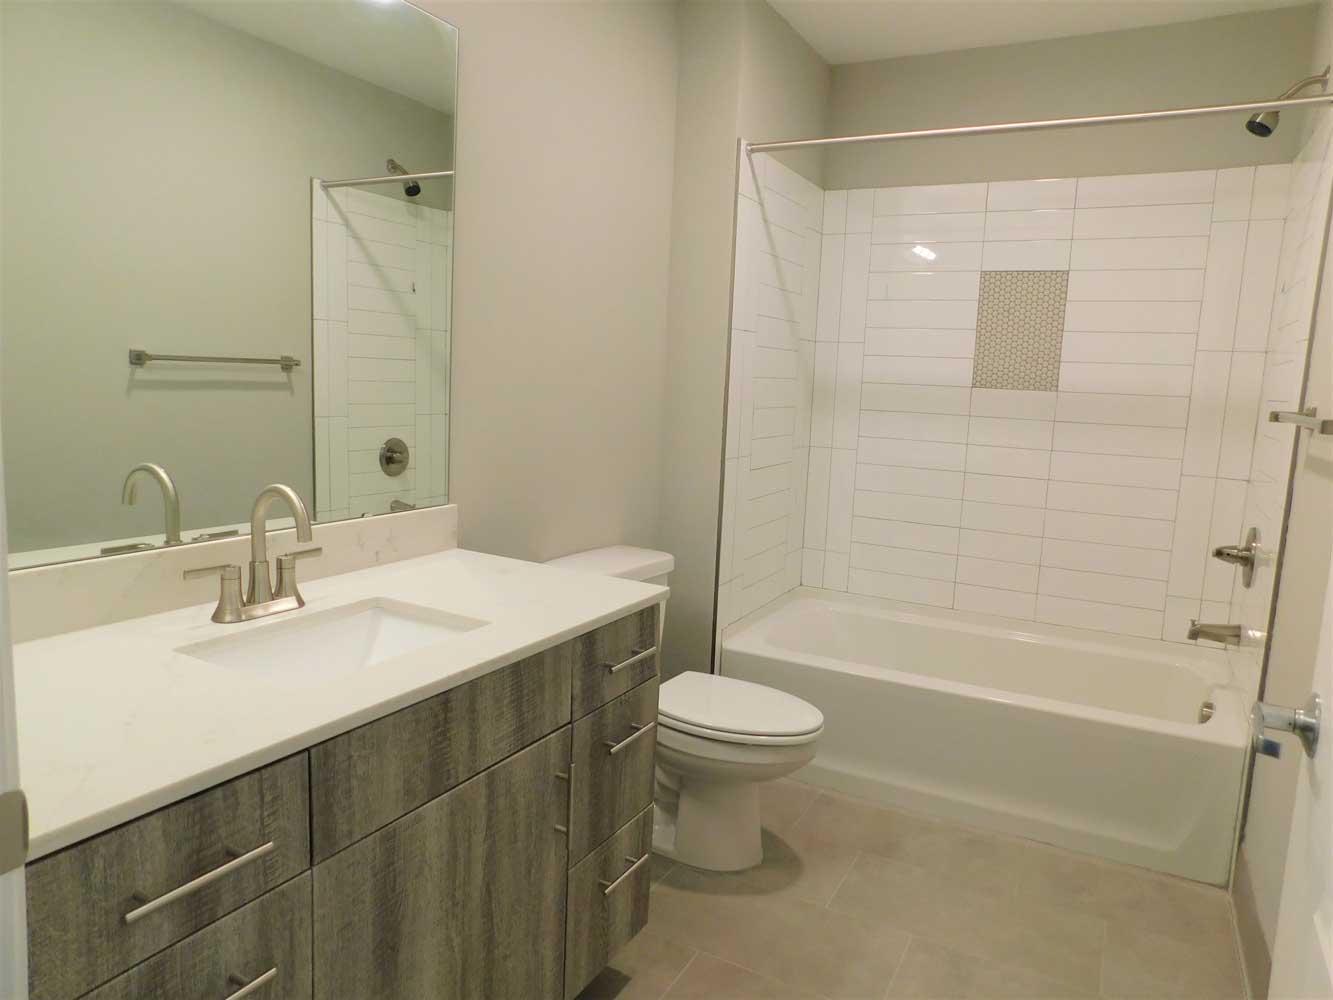 Shower and Tub at Midtown Plaza Apartments in Kansas City, MO